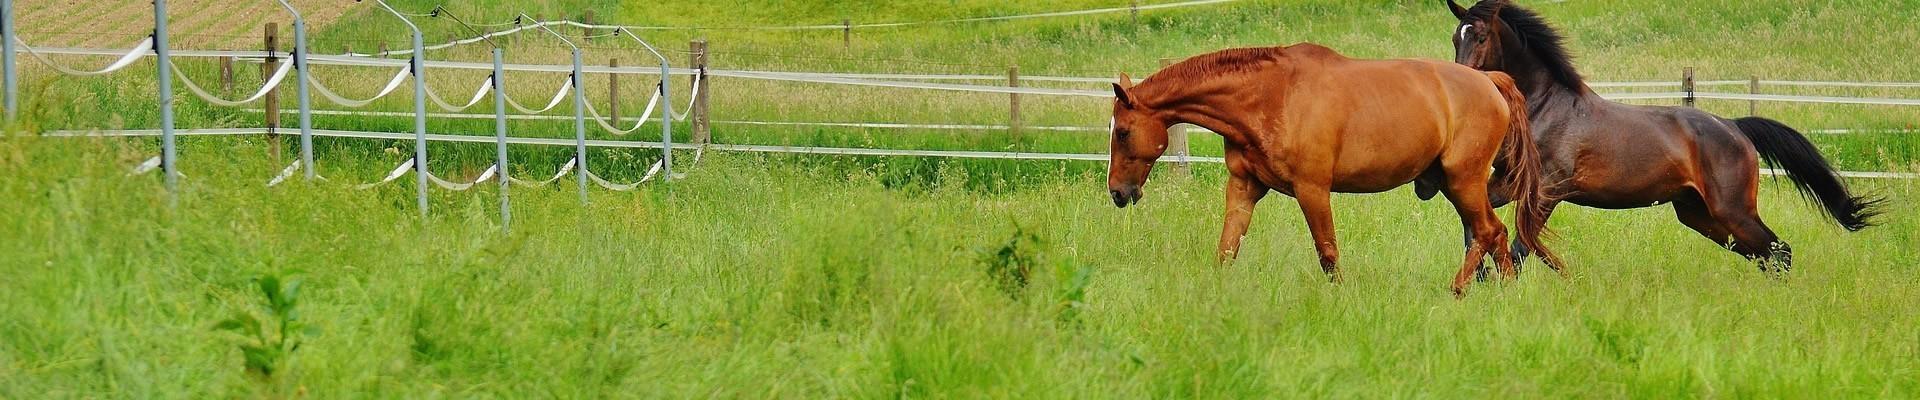 Horse Paddock Grass Seed